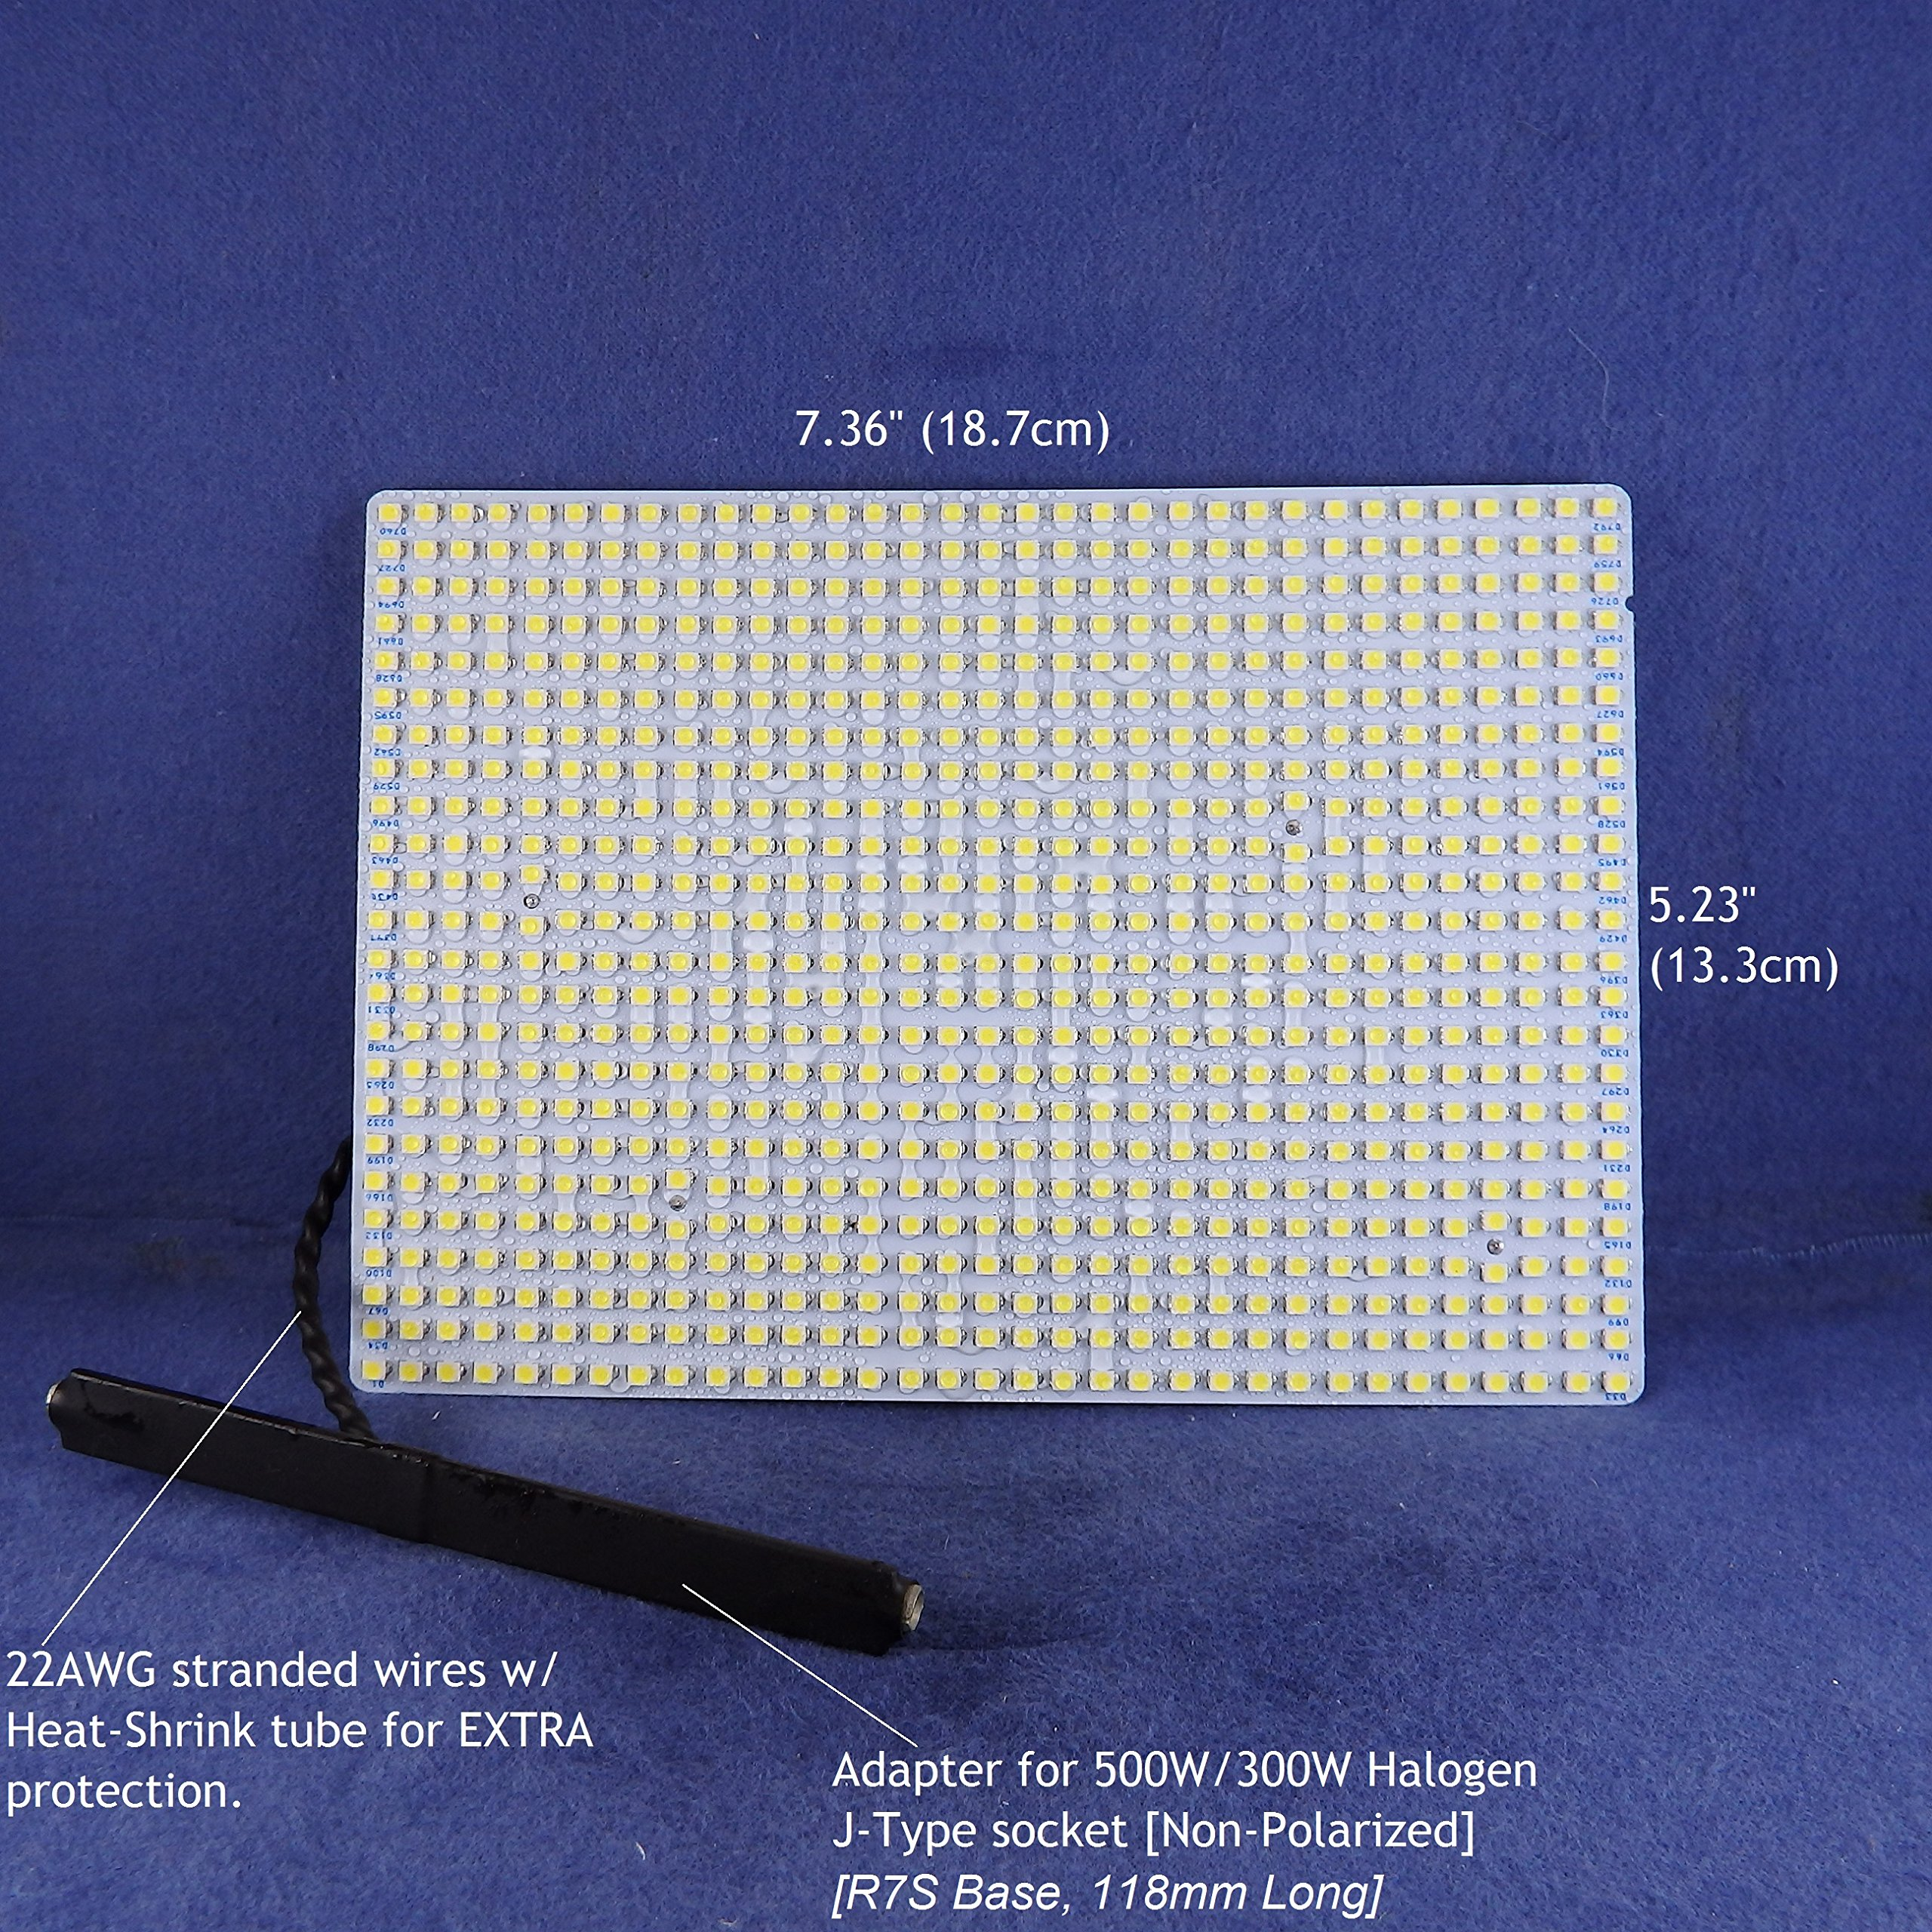 LED Panel for RETROFIT 300W/500W FLOOD LIGHT Halogen light fixtures -- 7000Lumens 33Watts -- WARM WHITE (4000K). P/N: SPTL792LRC-4K by SOLARA-USA